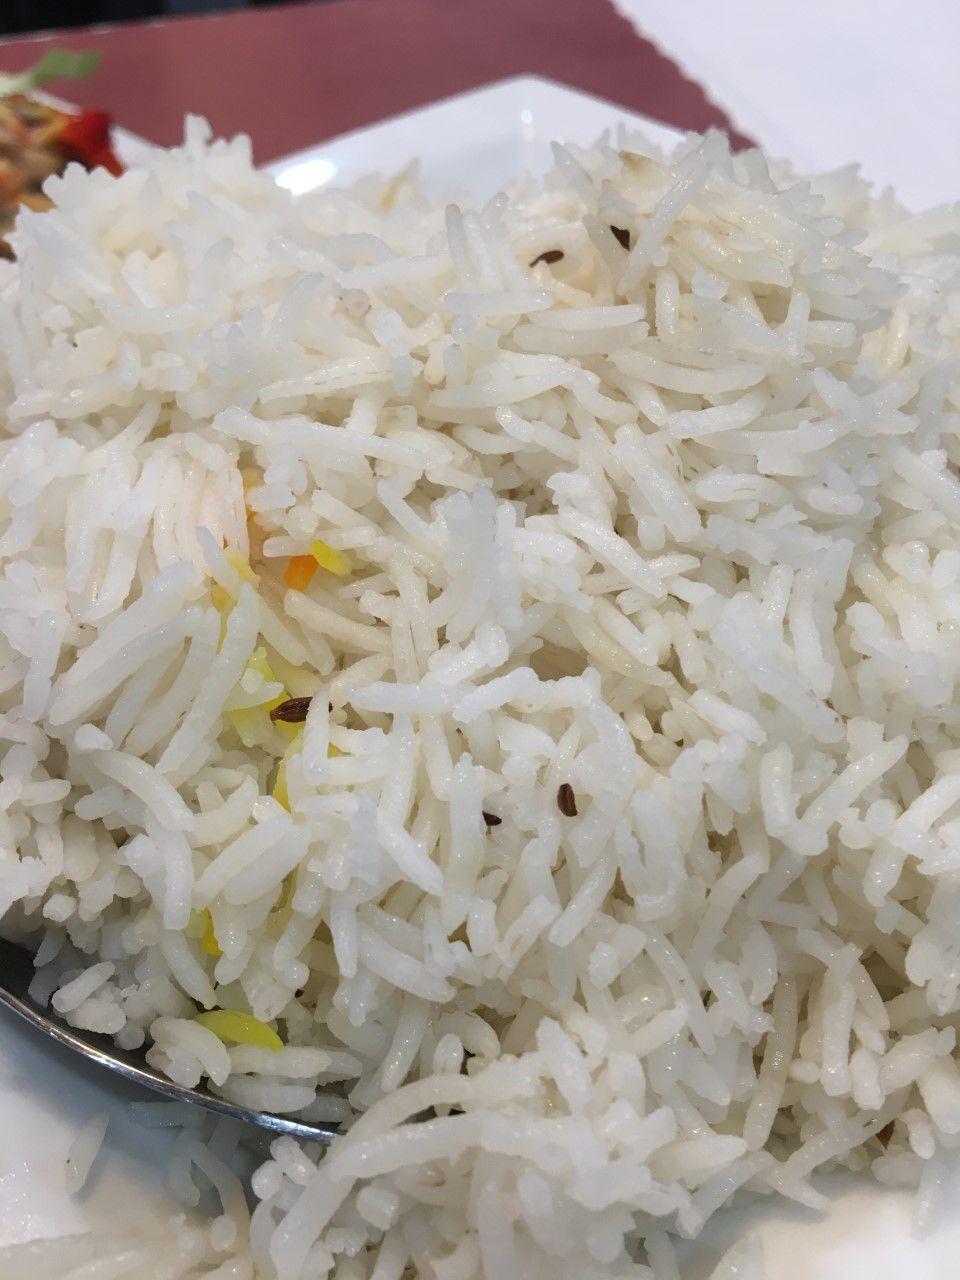 20210602-gm-food-guy_Basmati rice from Nawab.jpg